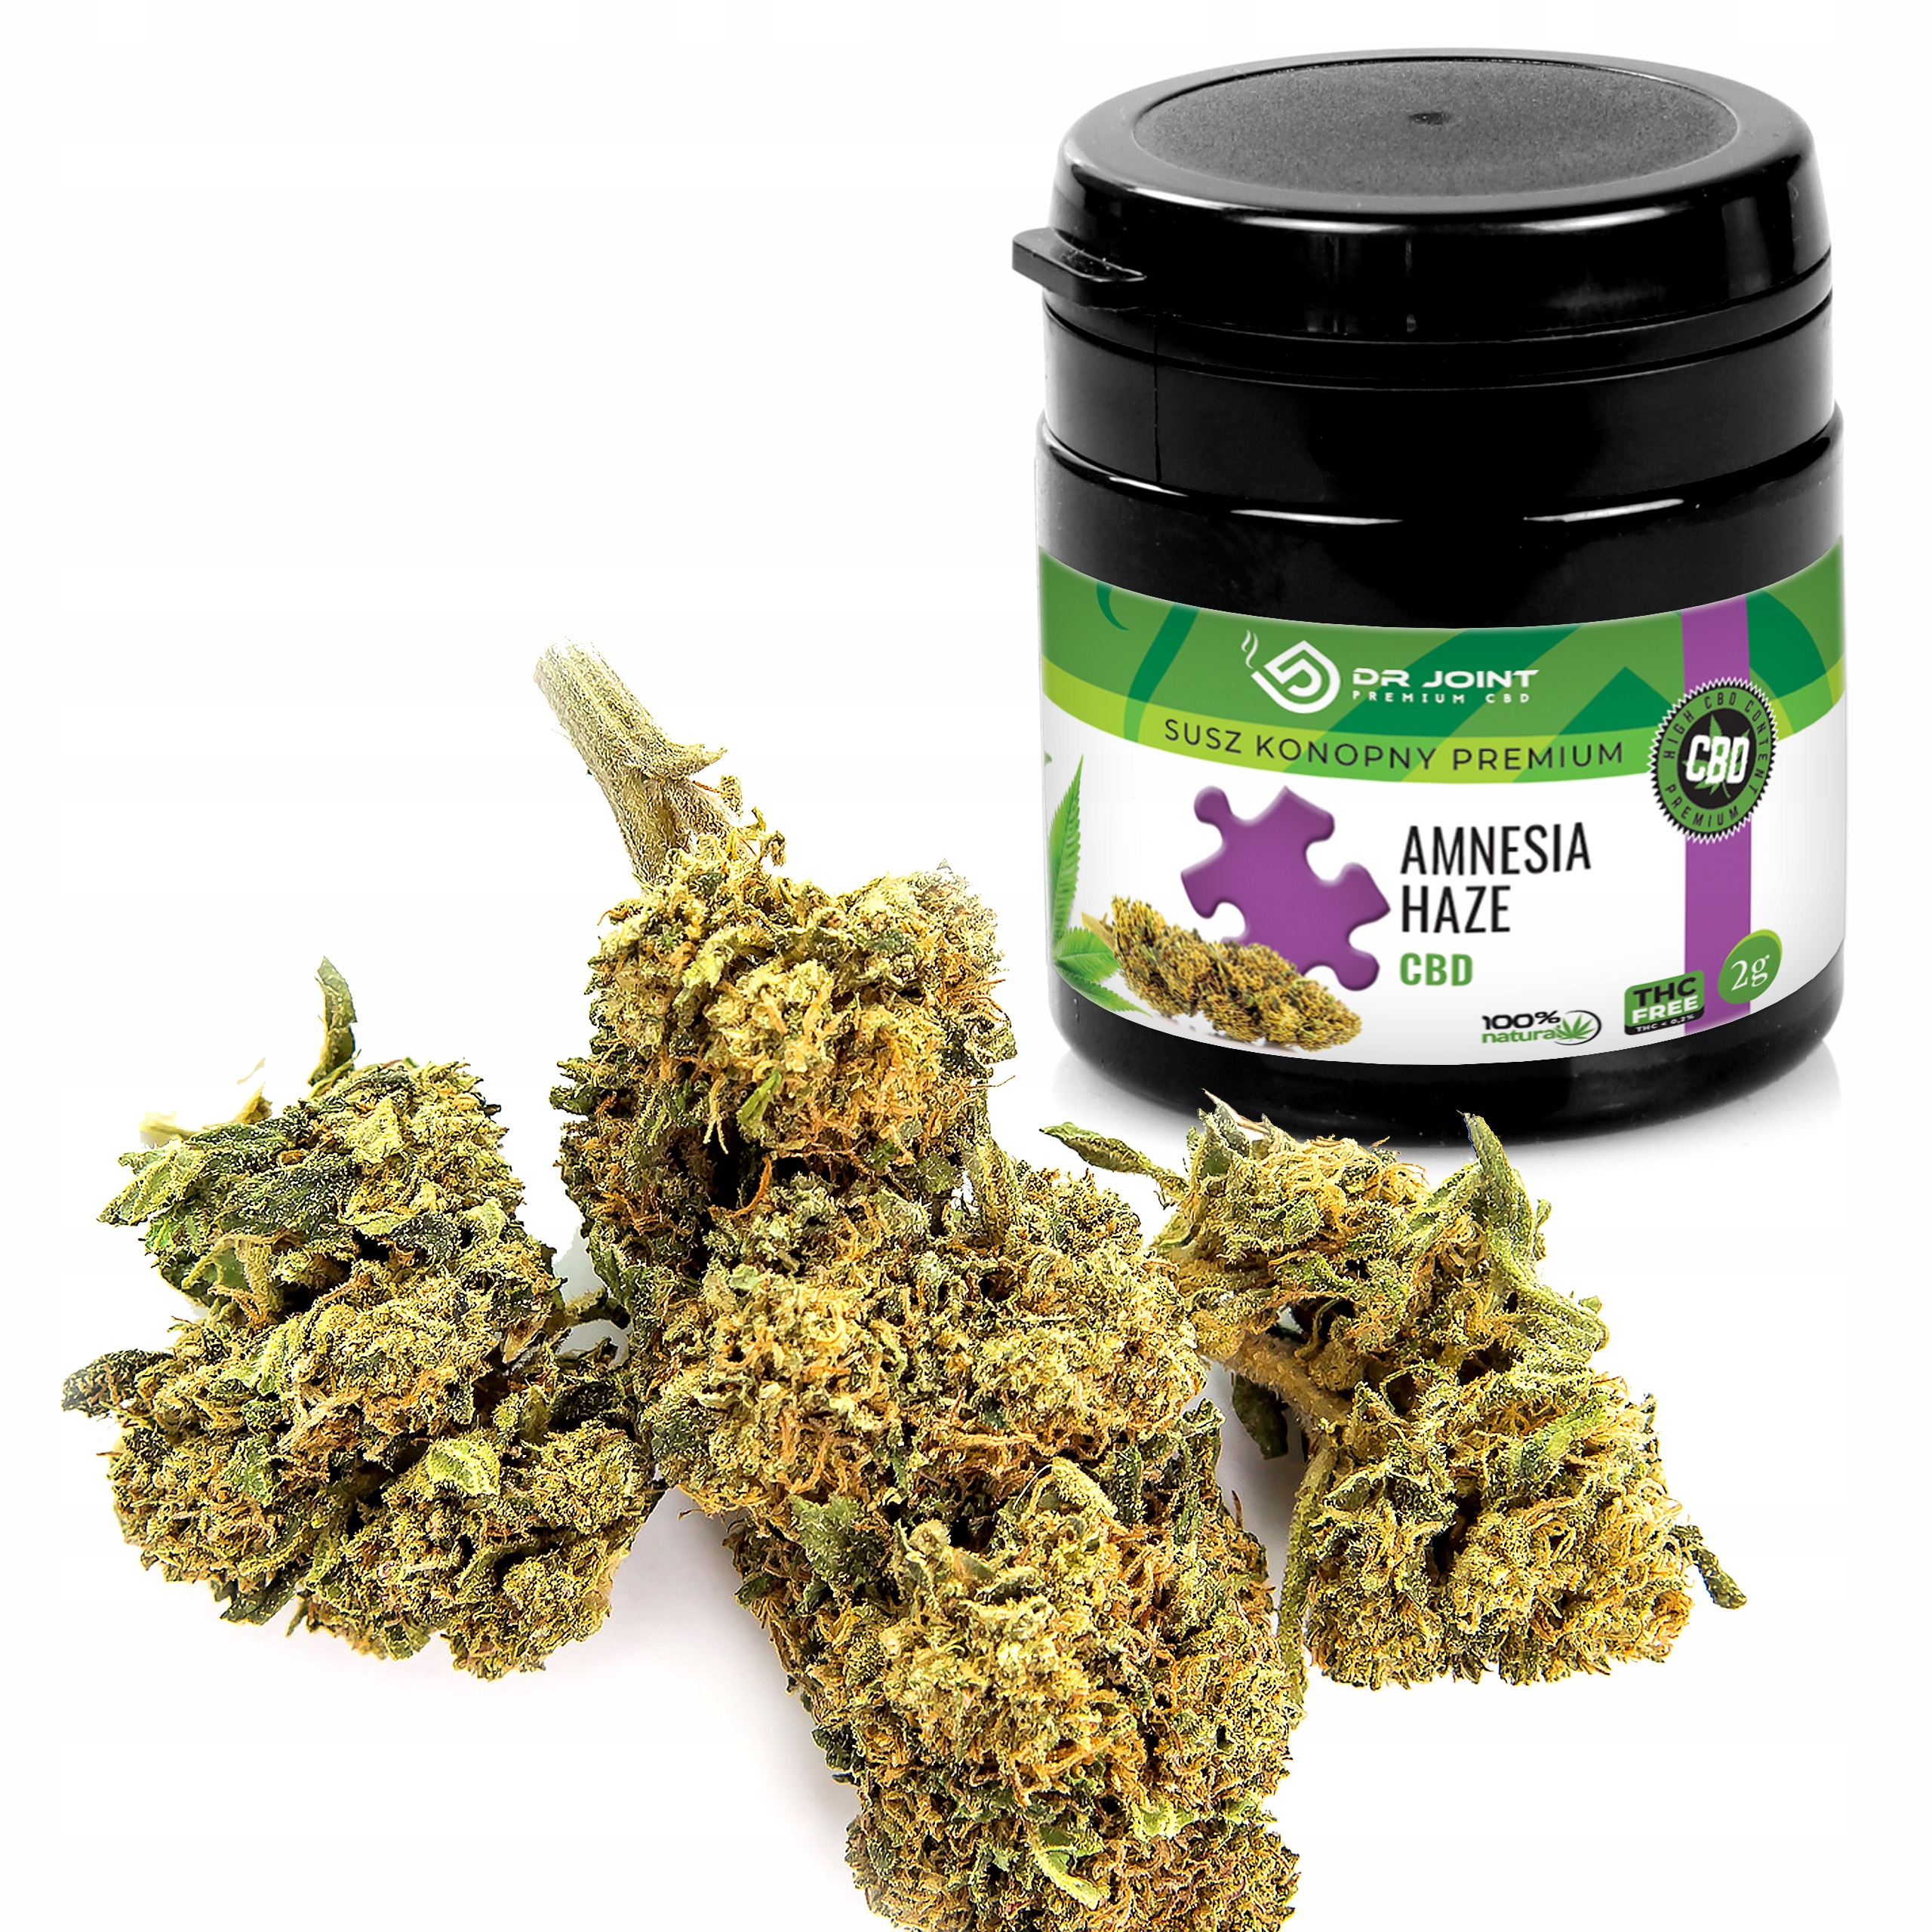 Susz Konopny Premium 39% Amnesia Haze CBD 2 g